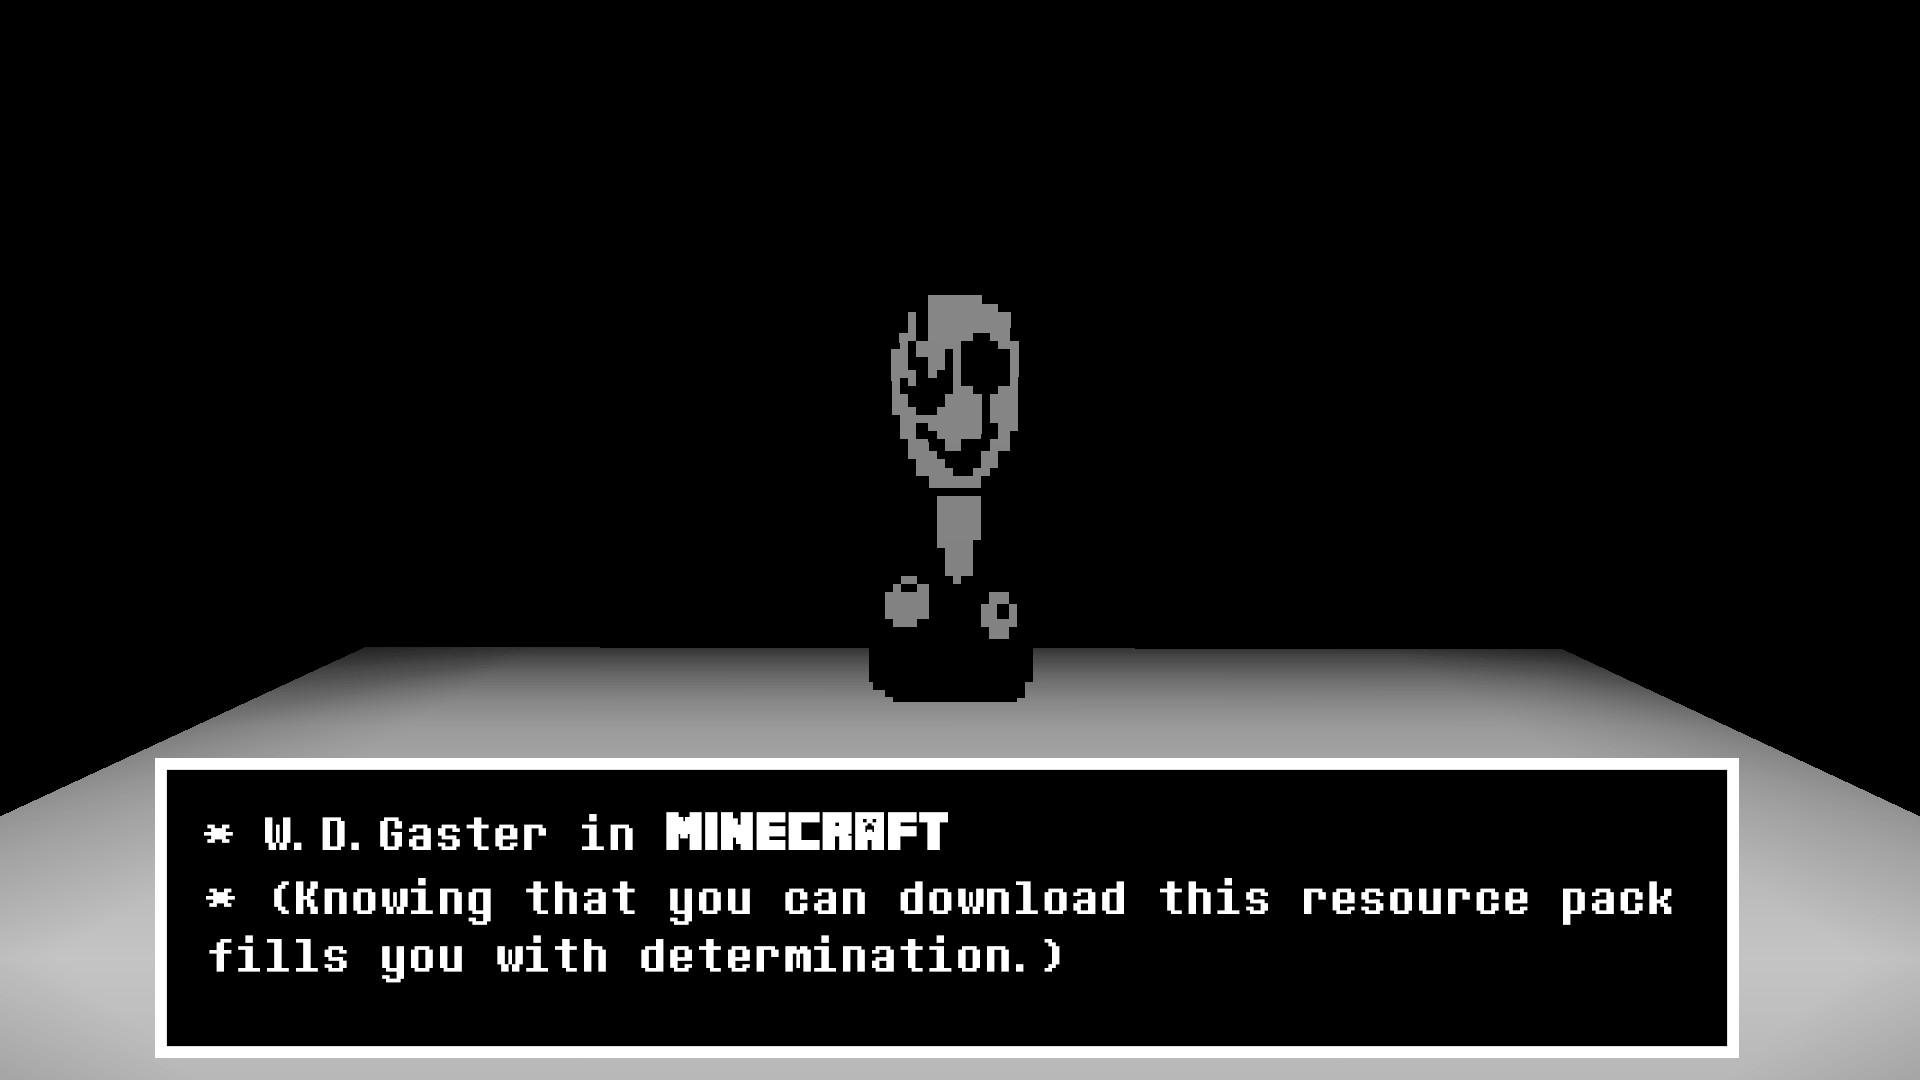 … W. D. Gaster in Minecraft (Resource Pack) by Dragoner7